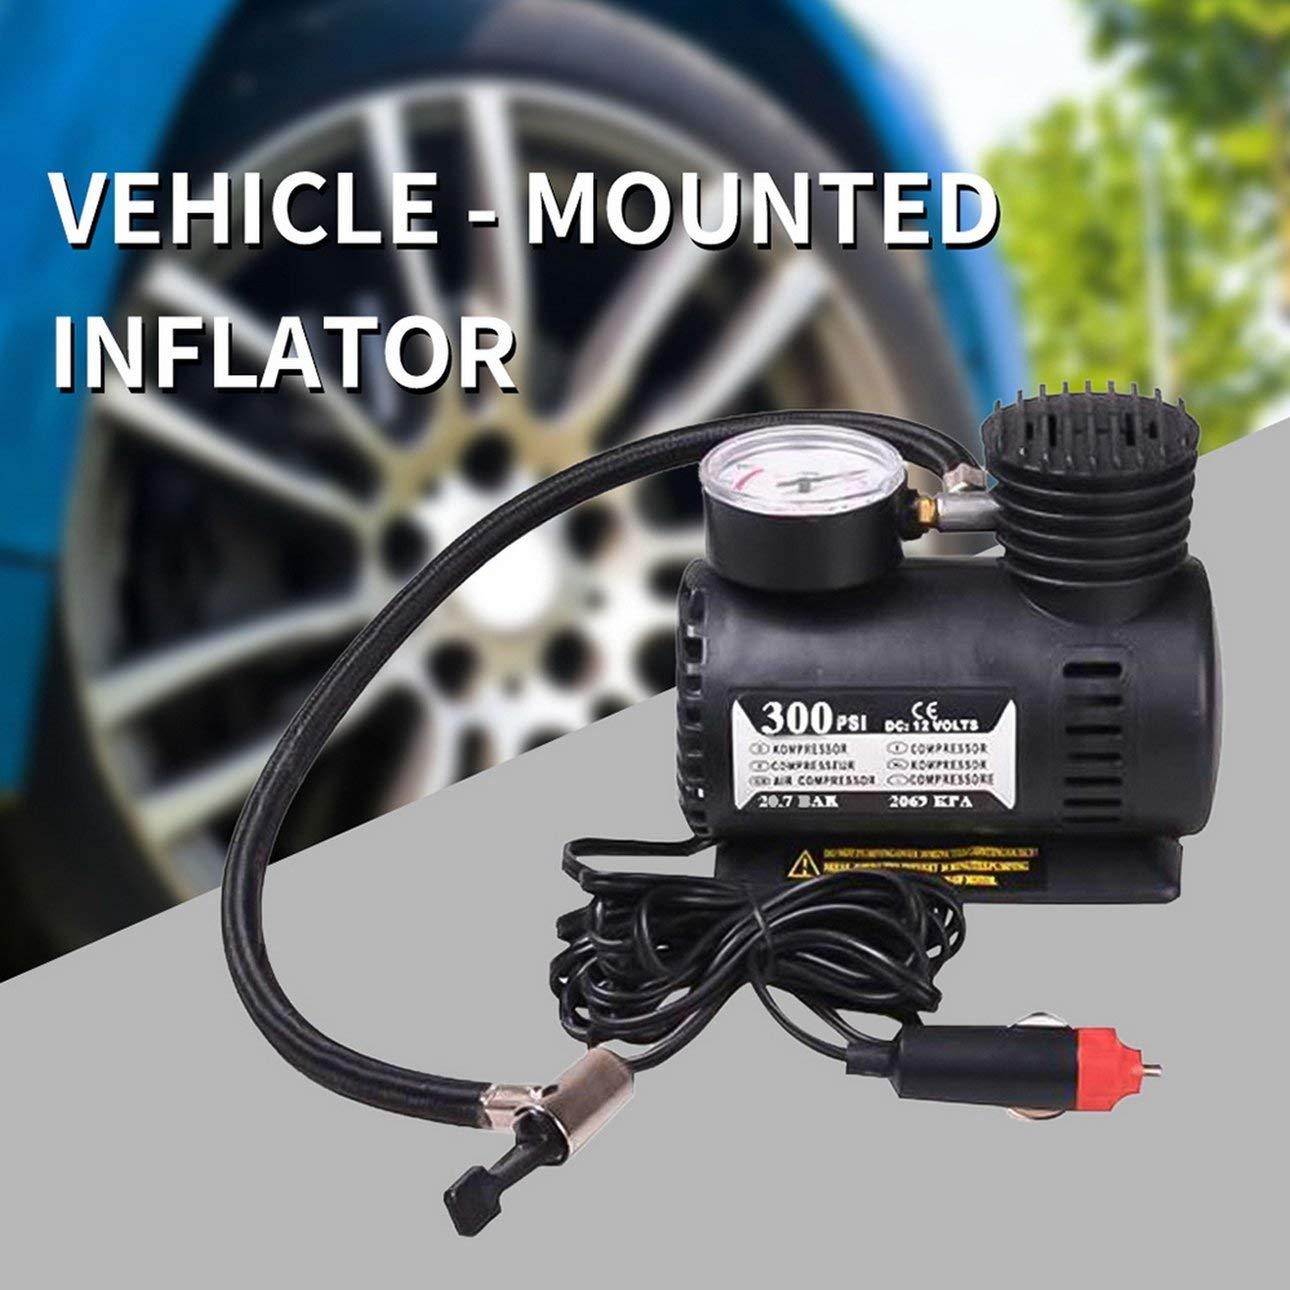 Black 12v Miniature Locomotive Air Pump Vehicle Tire Air Compressor Portable Vehicle Electric Small Air Pump